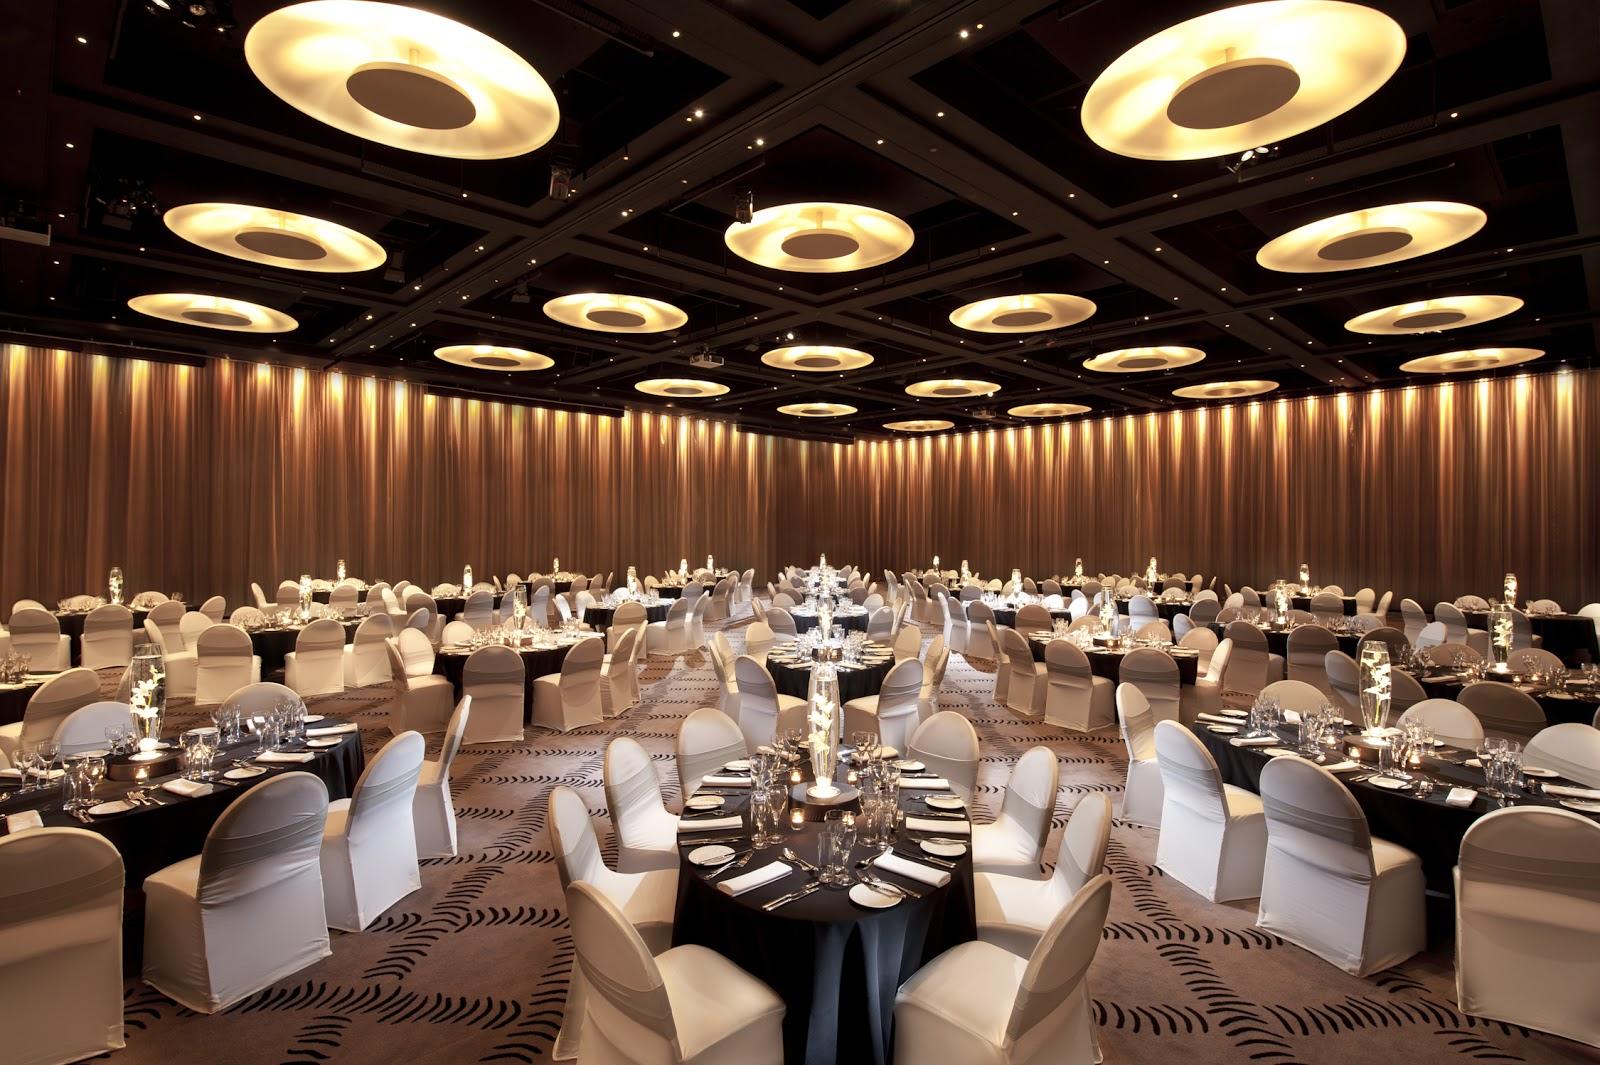 Ballroom Gala Dinner Hilton wedding Reception venue adlaide SA